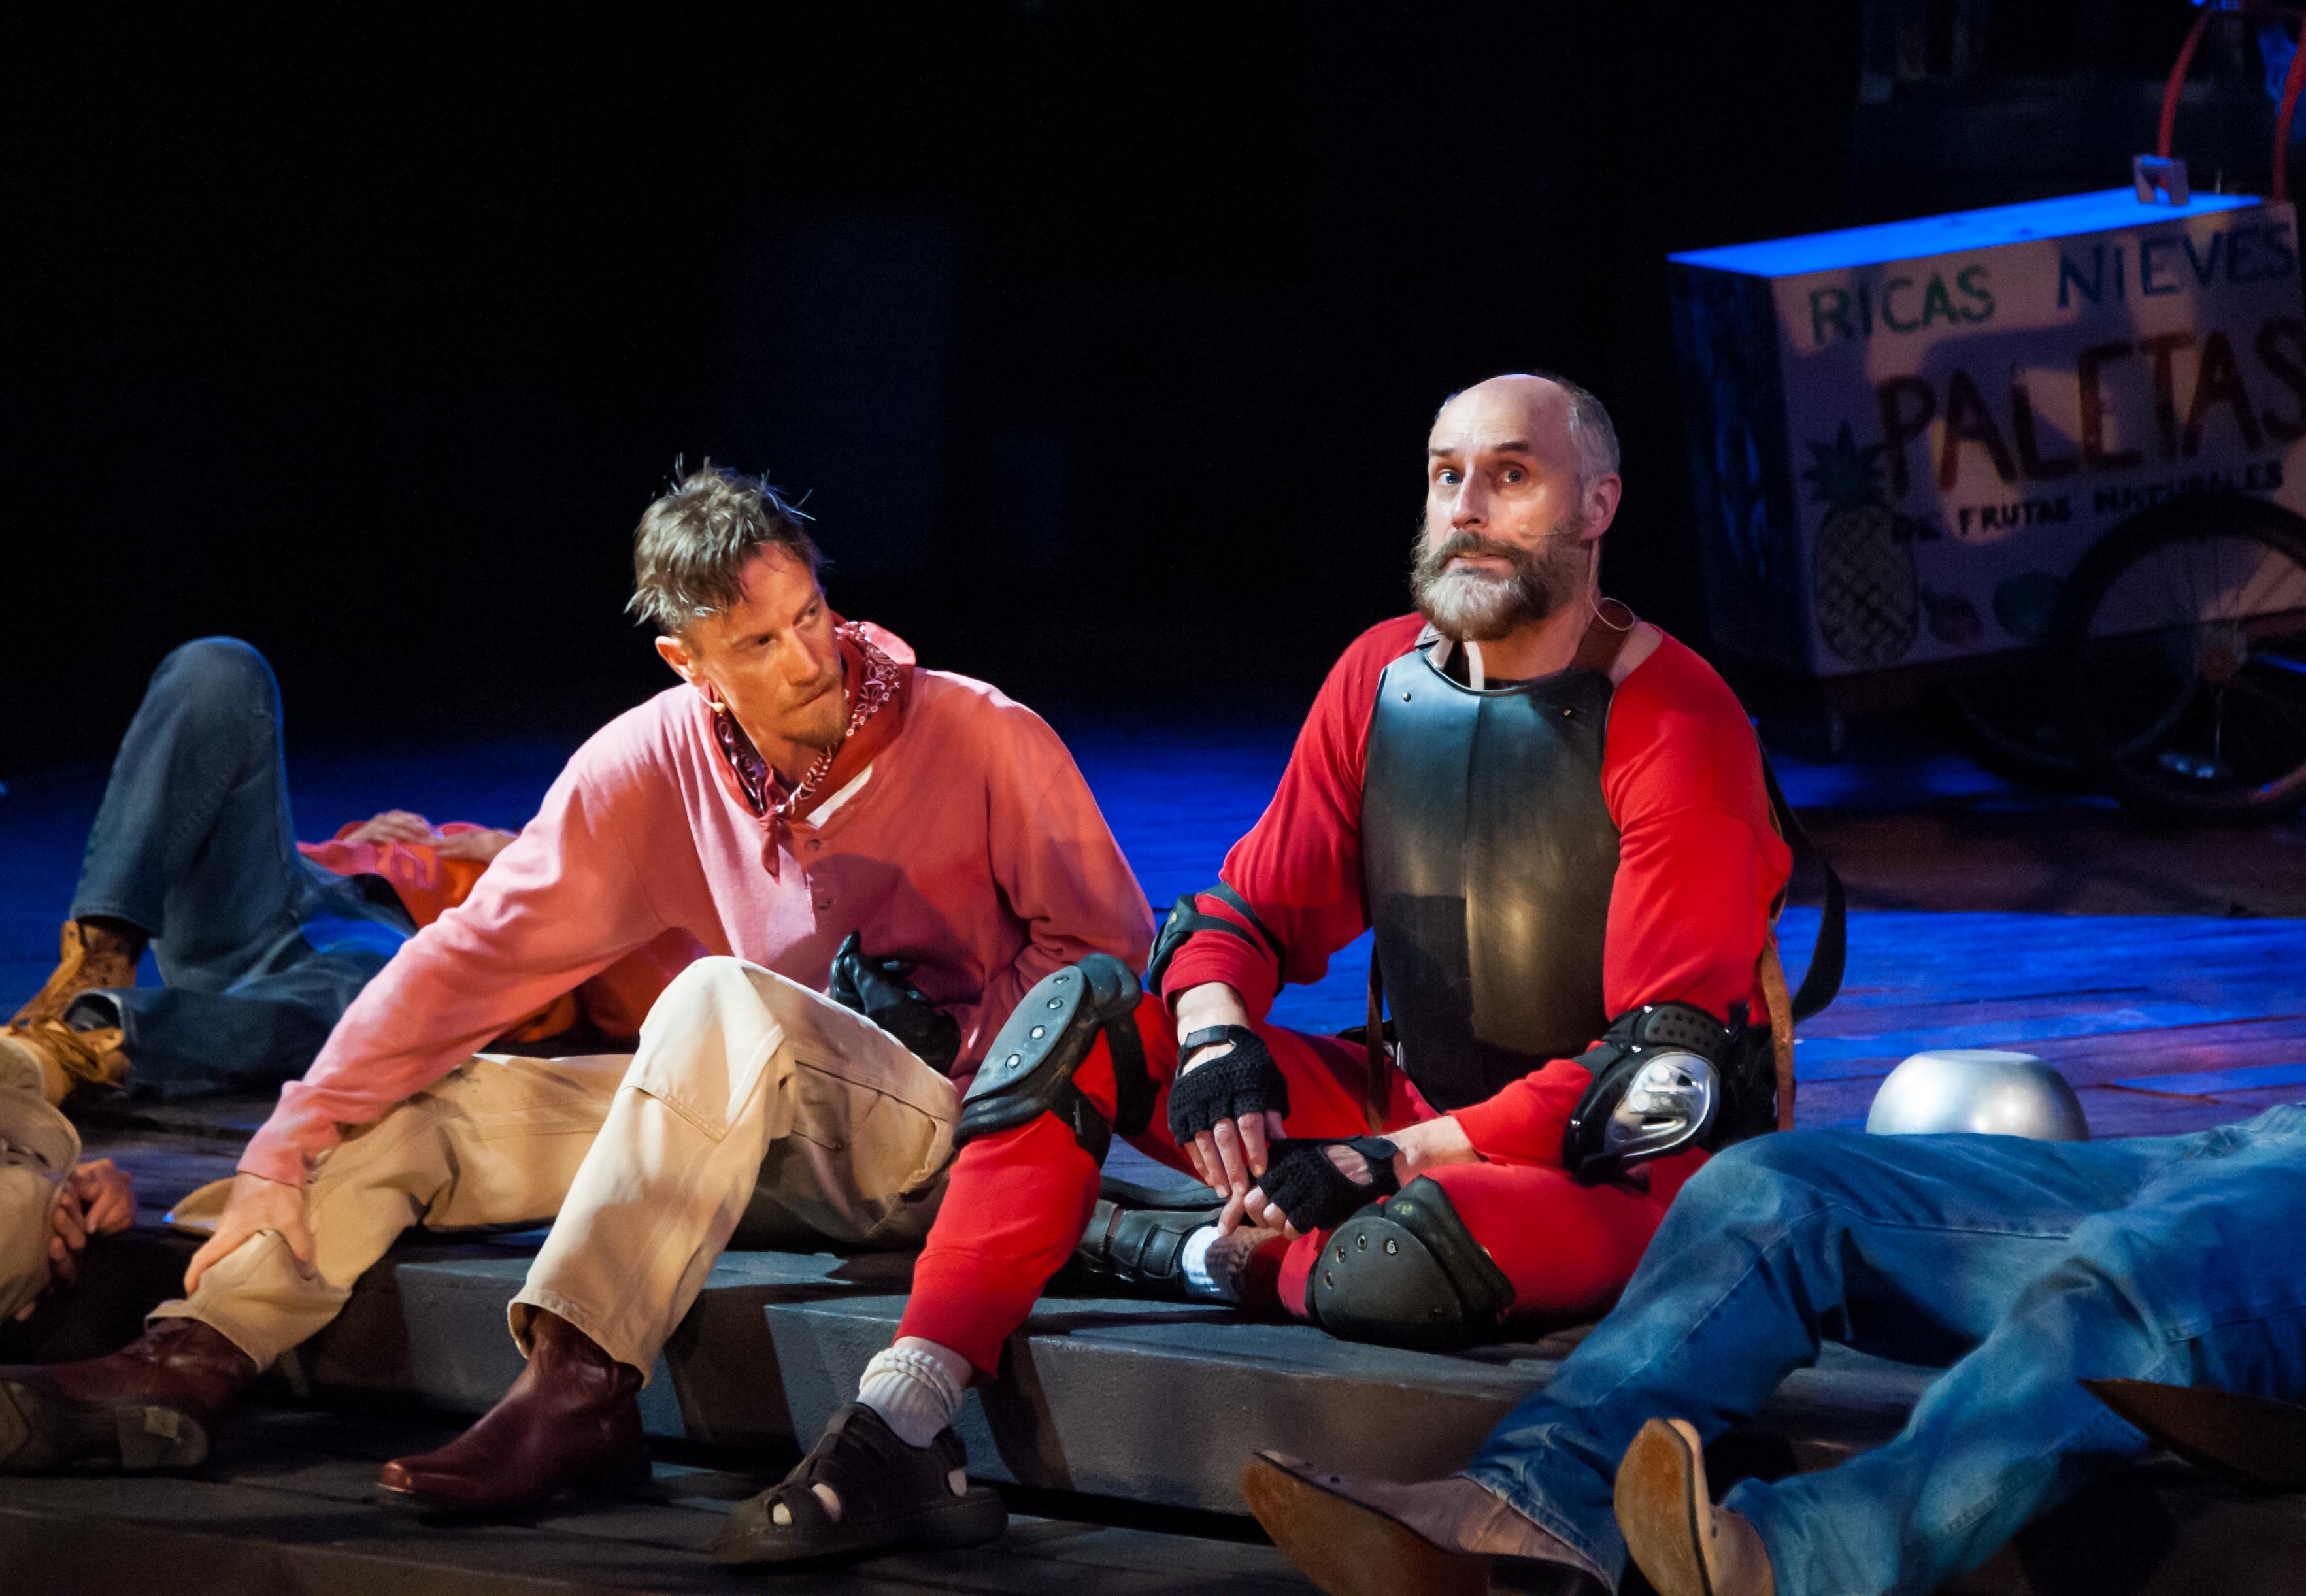 David Gotham as Cervantes and Jim Jorgensen as Don Quixote